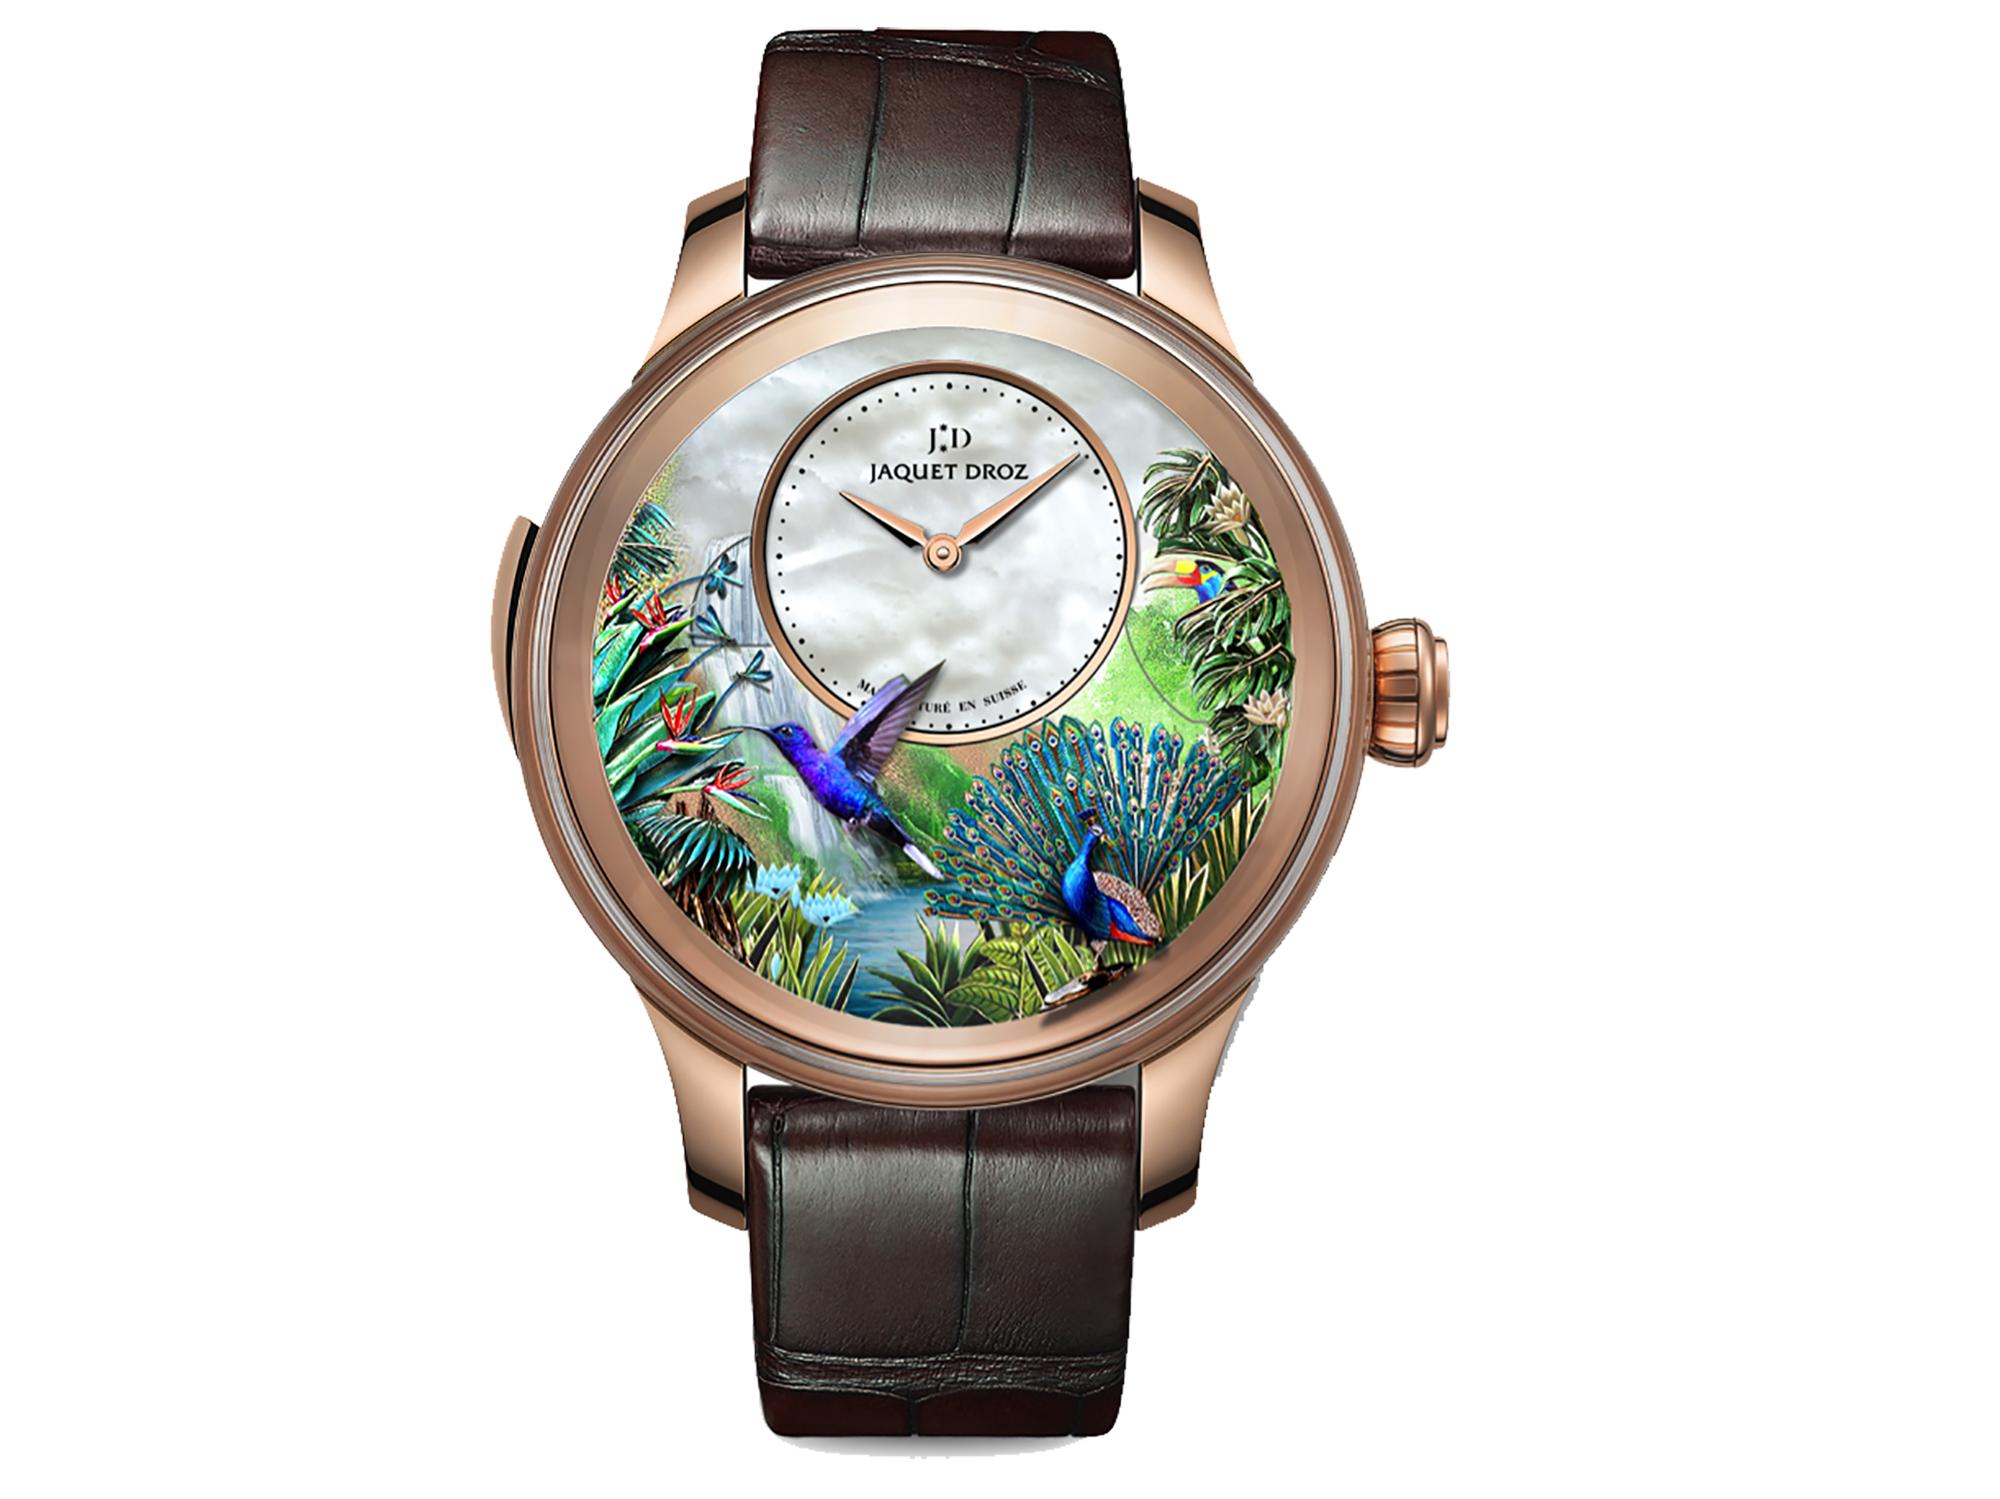 JAQUET-DROZ Tropical Bird Repeater